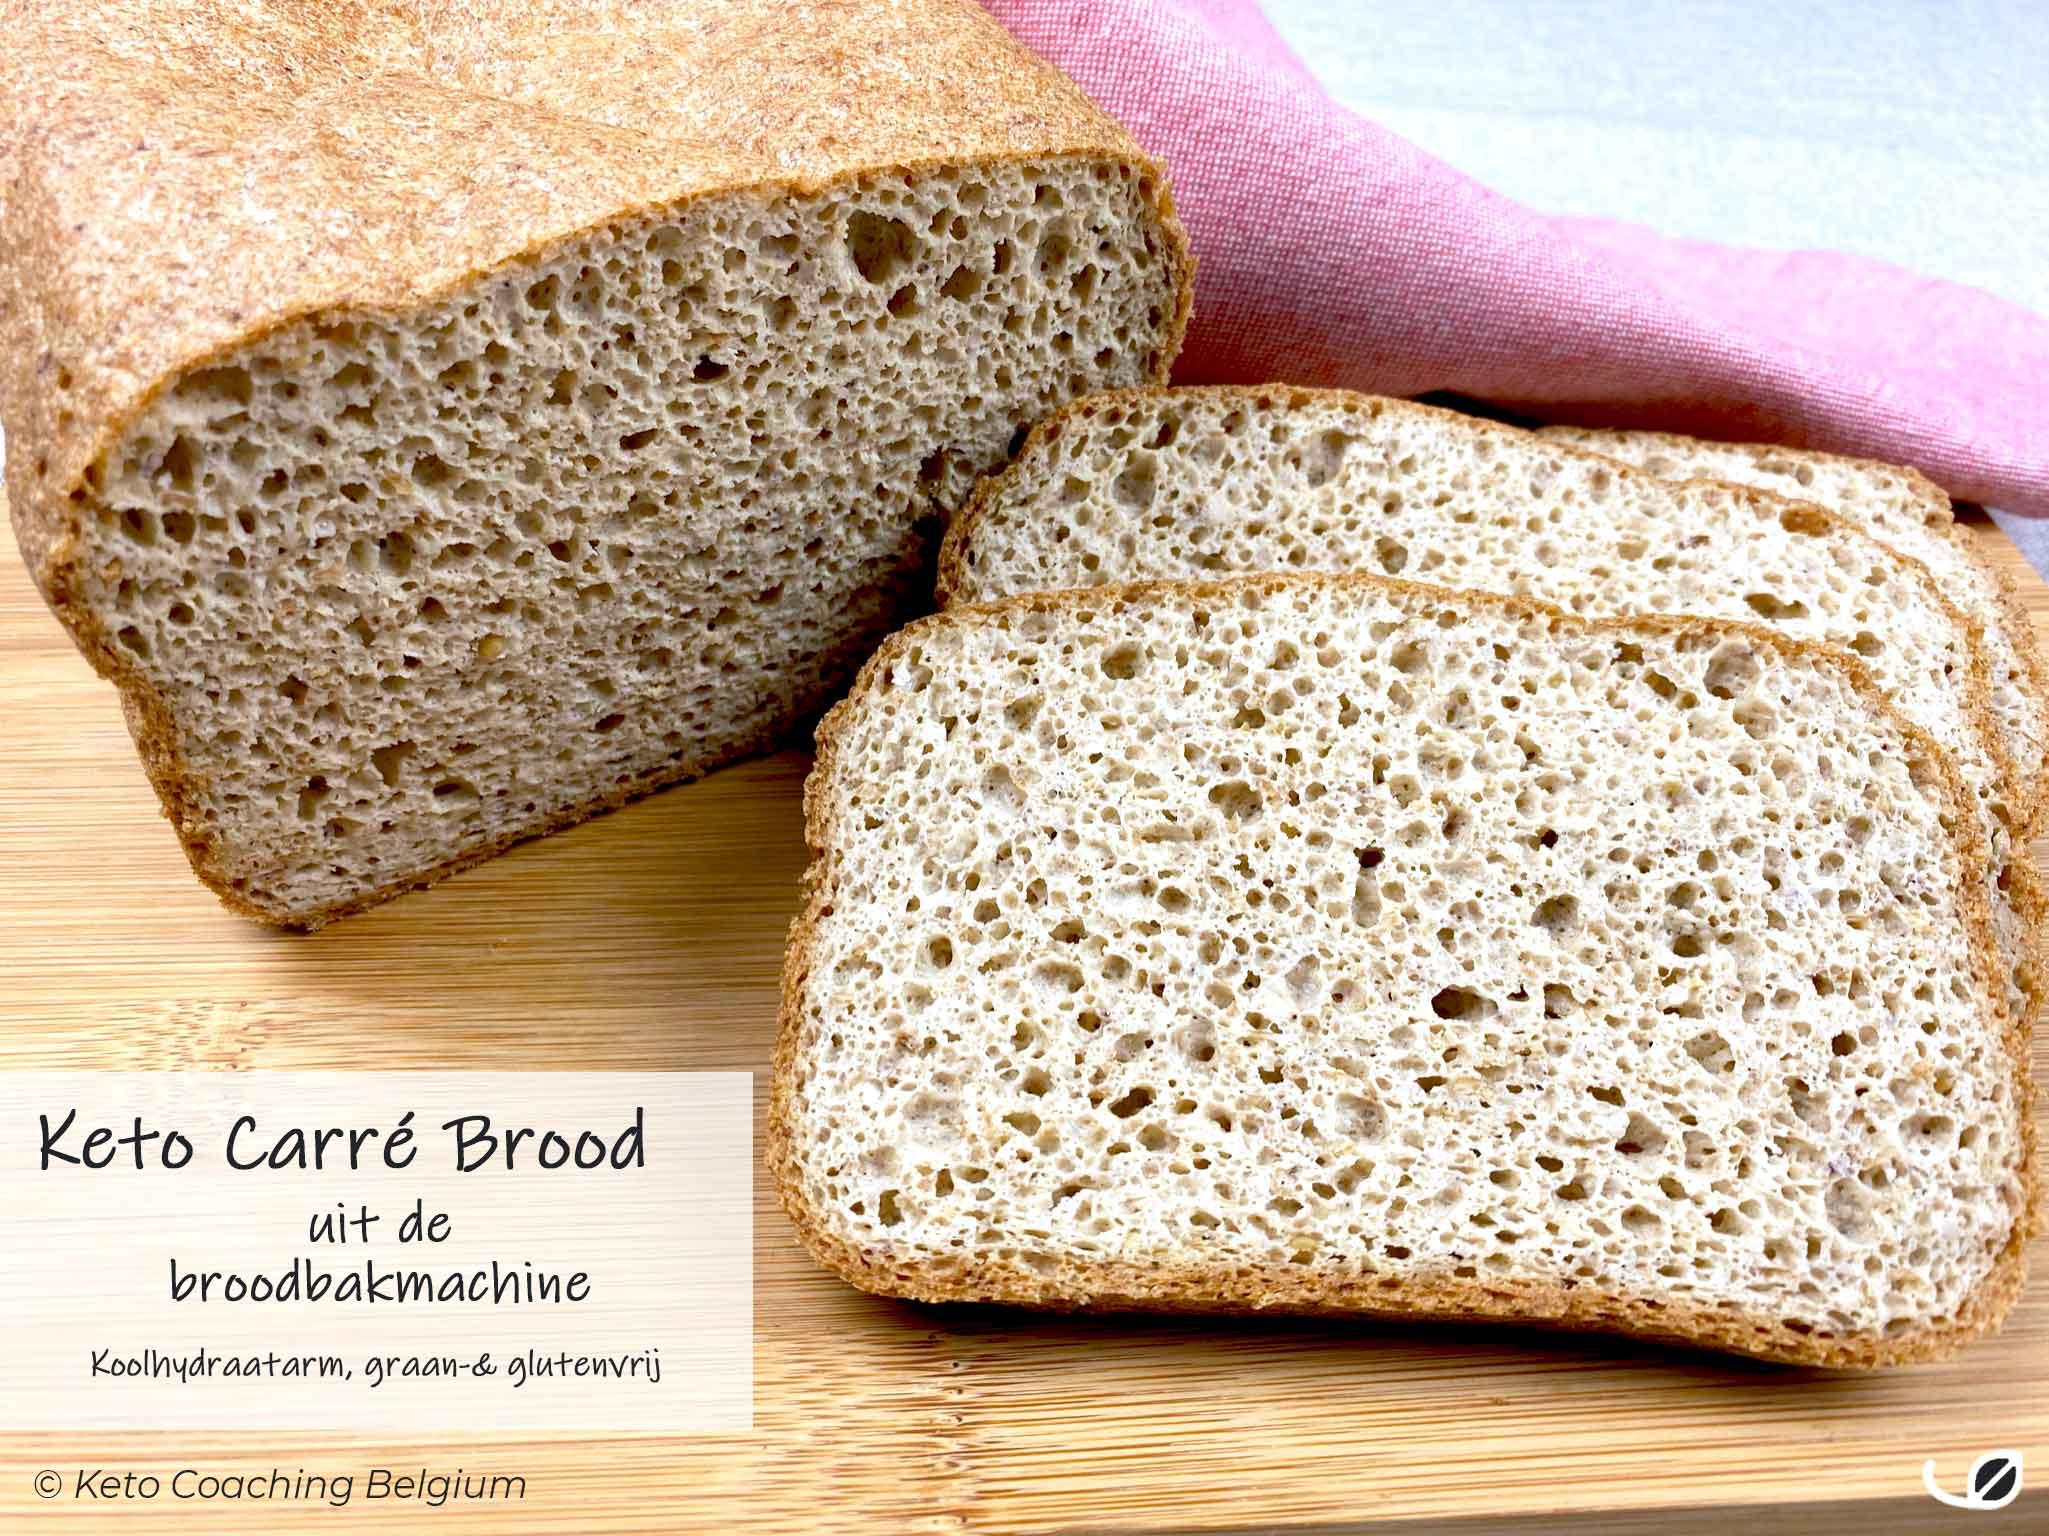 Keto Carré Pistolet brood broodbakmachine graanvrij glutenvrij koolhydraatarm